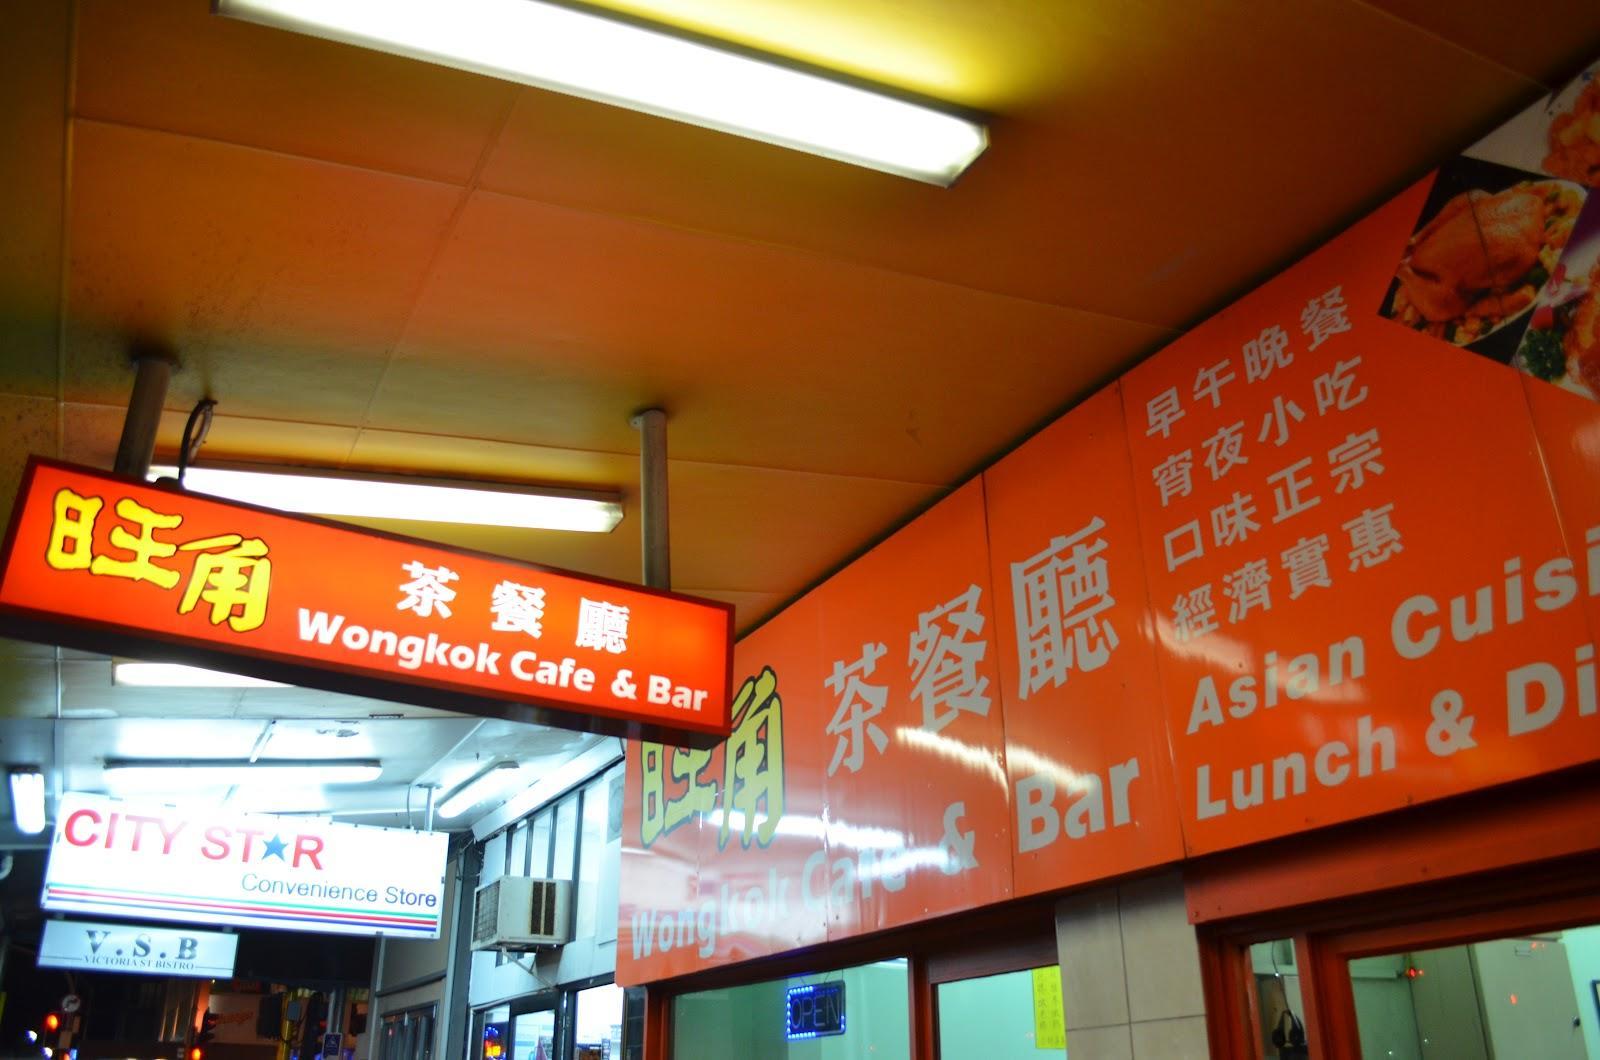 Wongkok Cafe & Bar